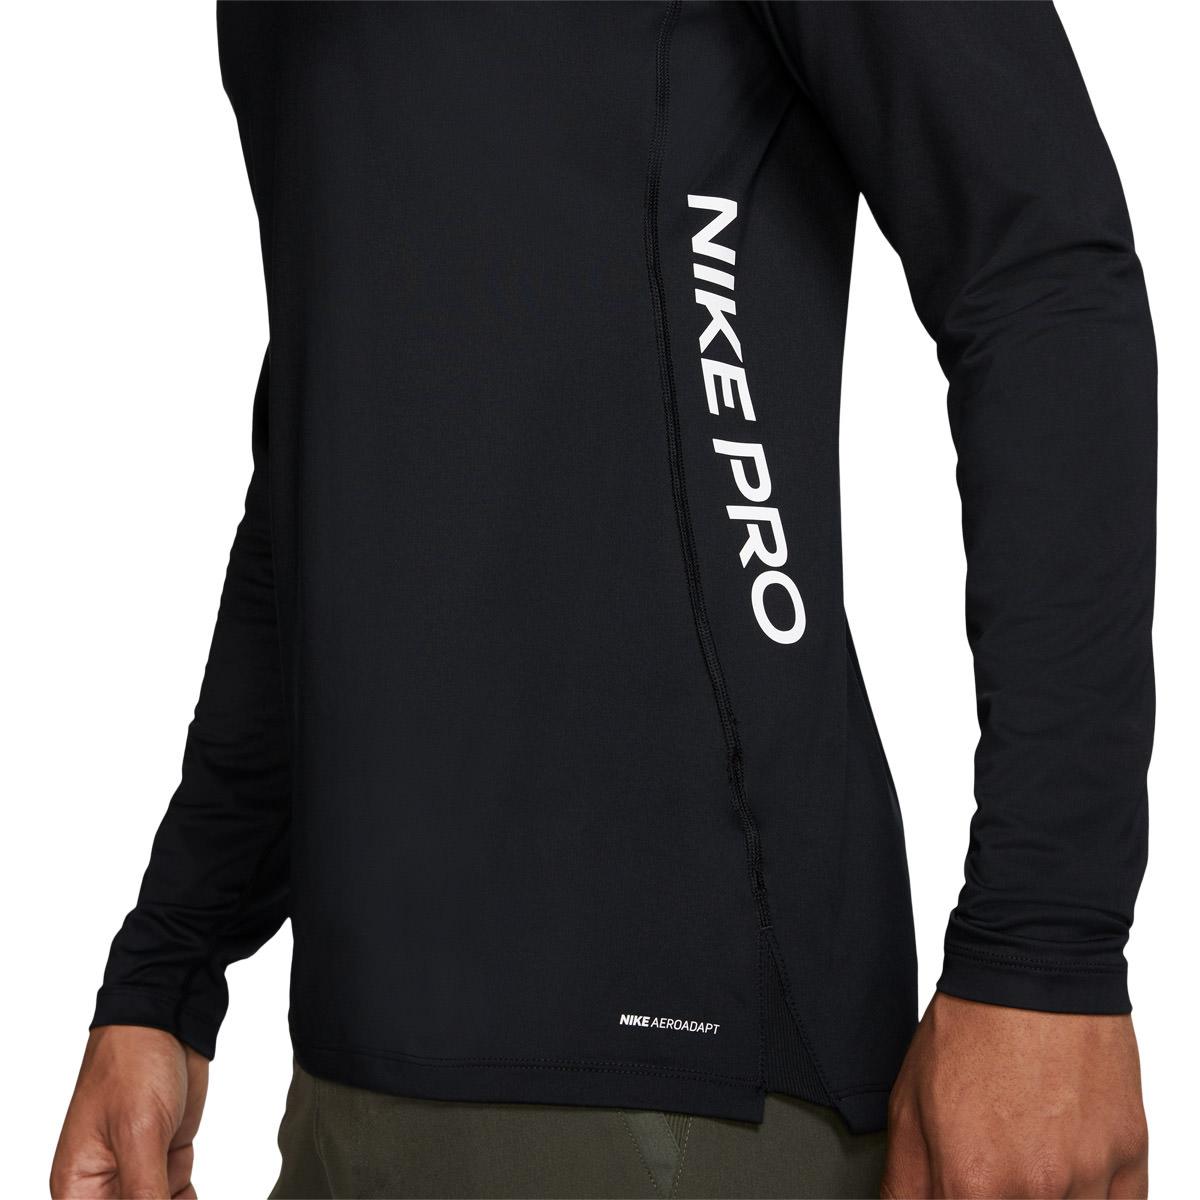 Nike Pro Aeroadapt Træningstrøje Herre